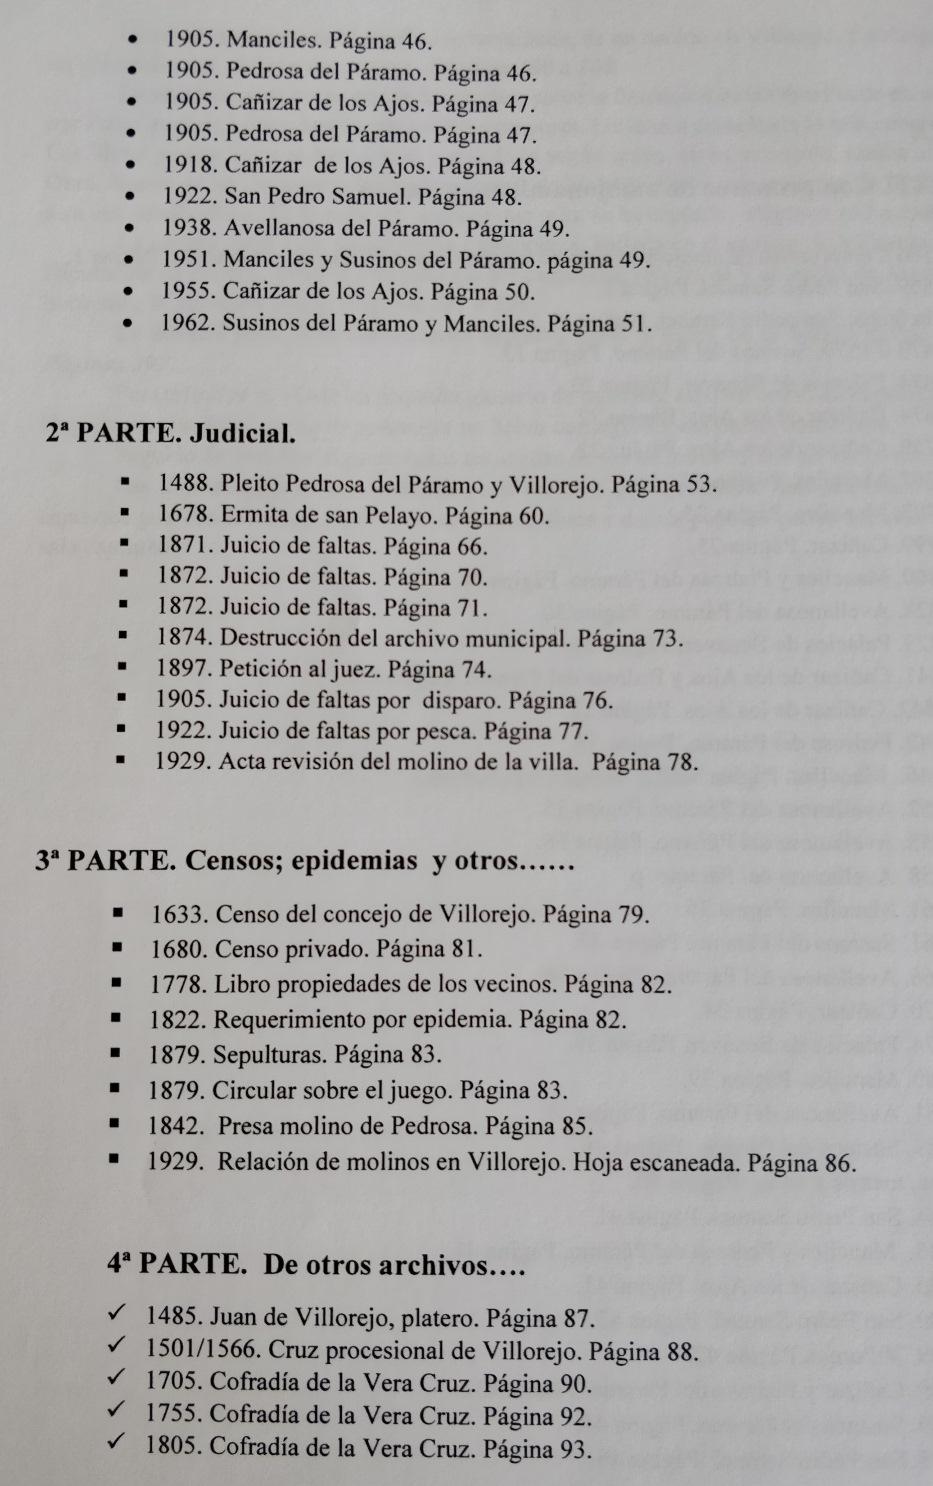 Libros-Alberto-6.jpg